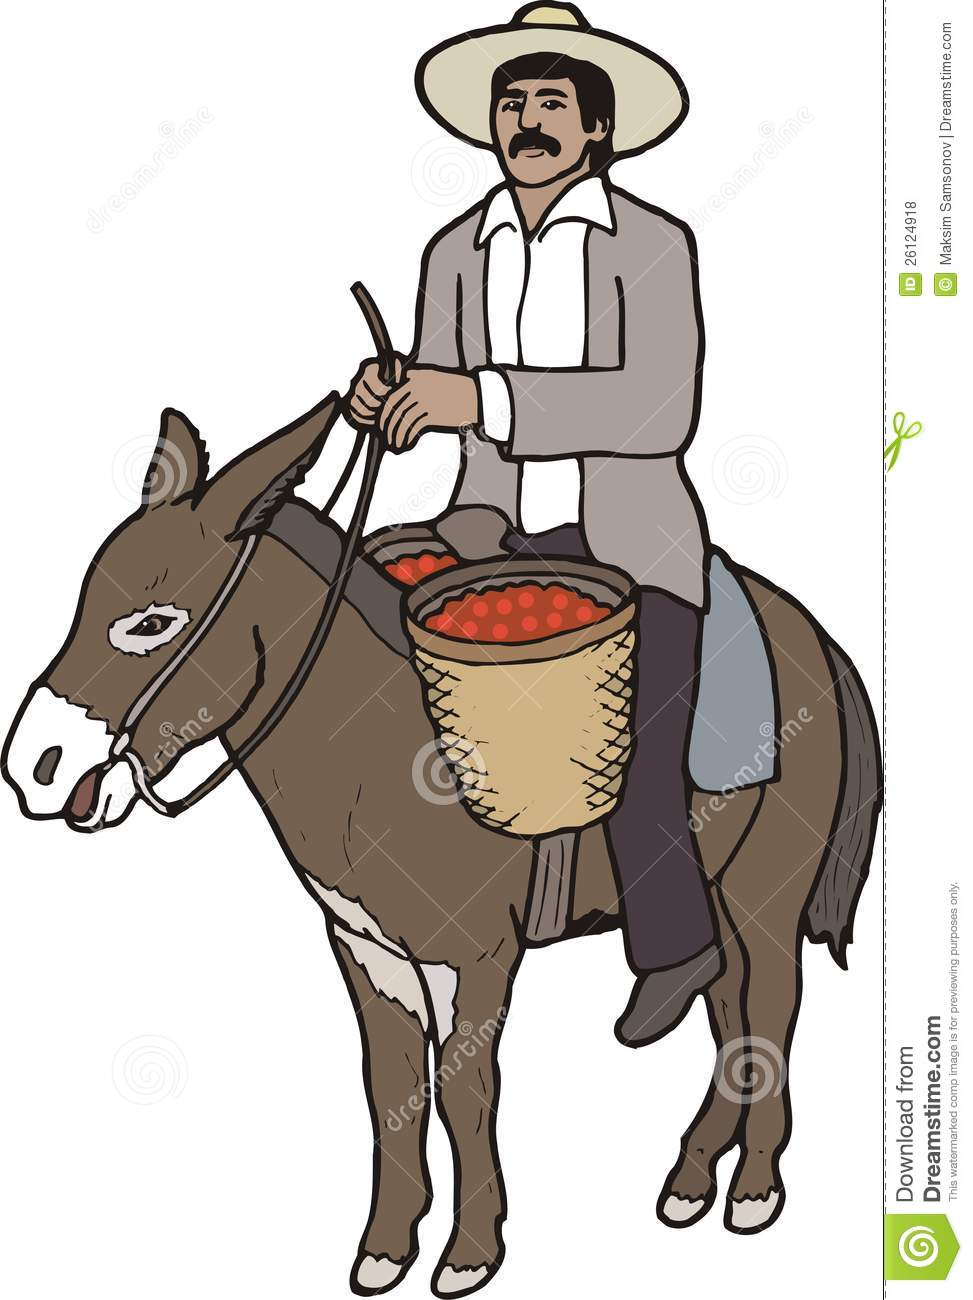 Man on a donkey clipart.